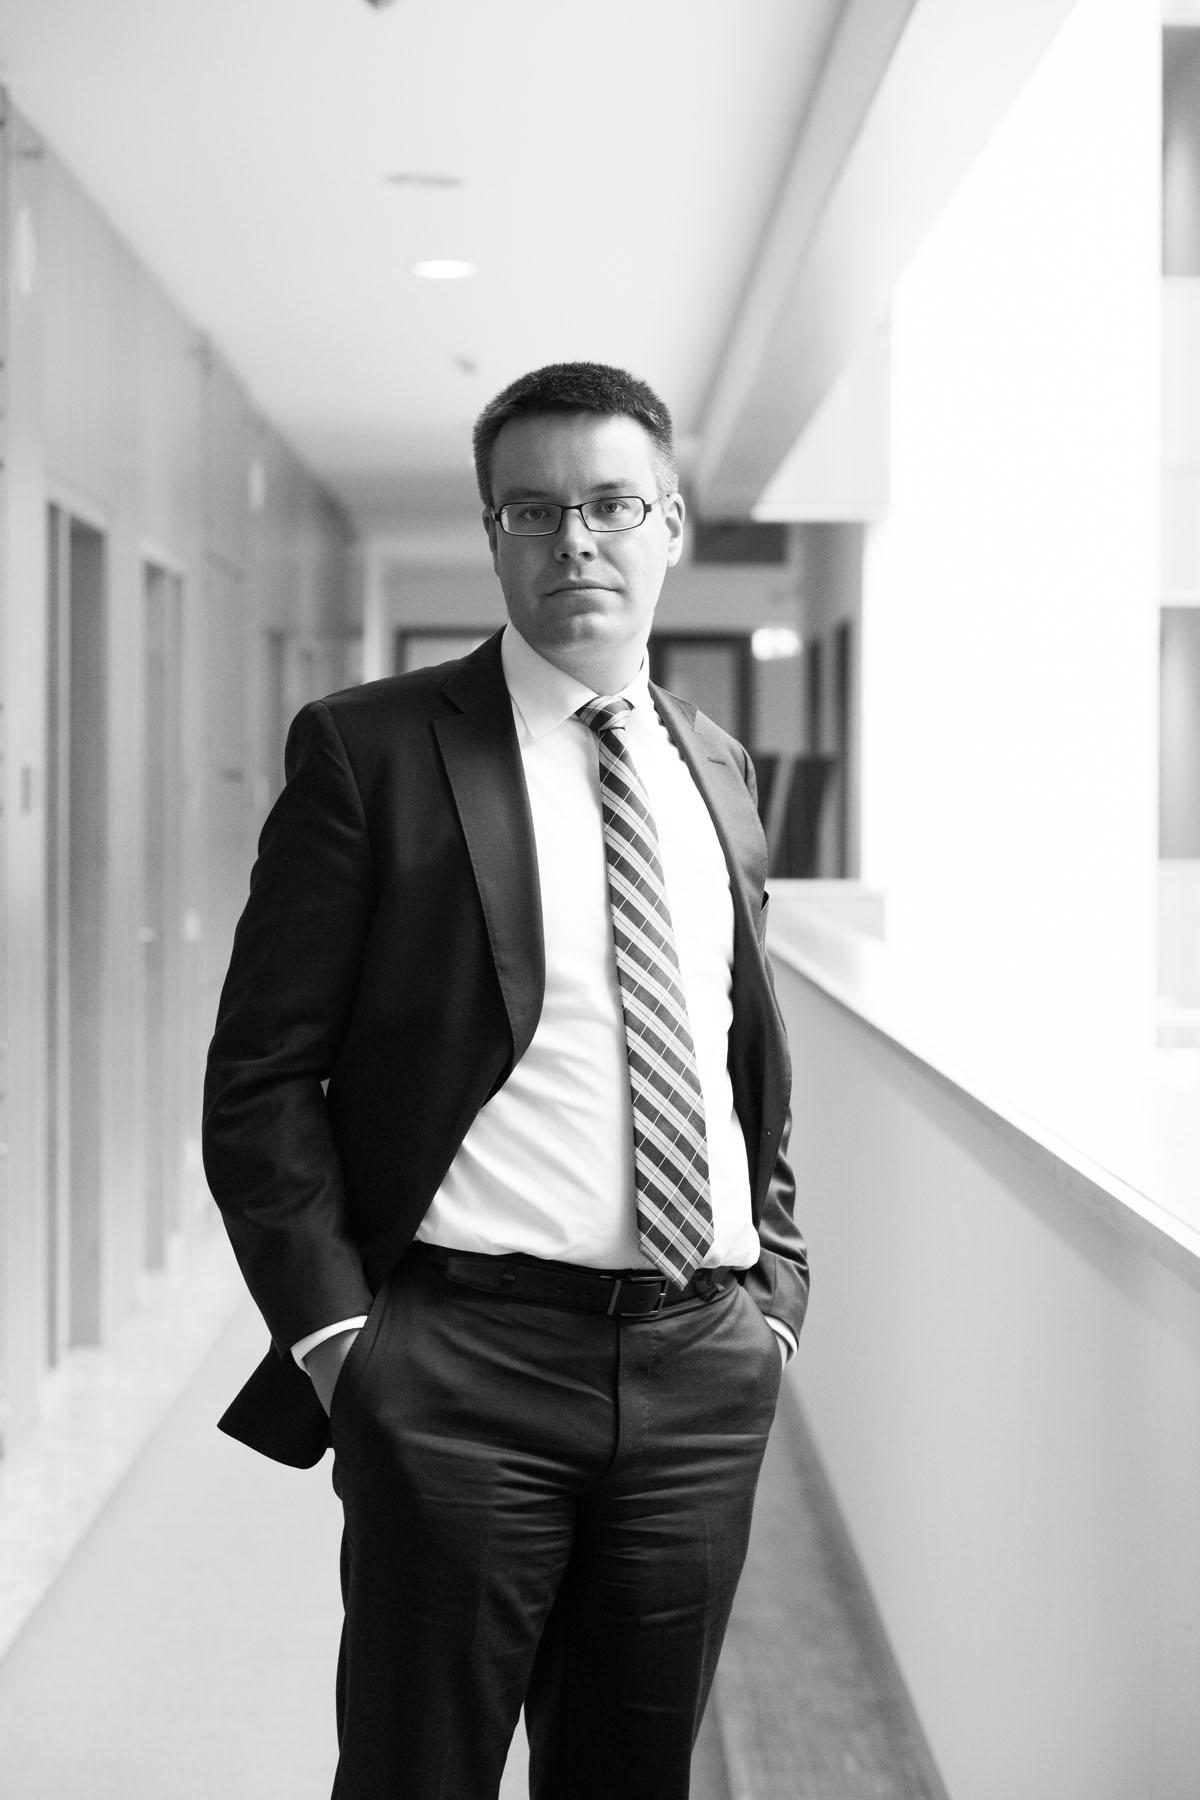 Tobias Lindner 1900 (c)2013 Paul Blau